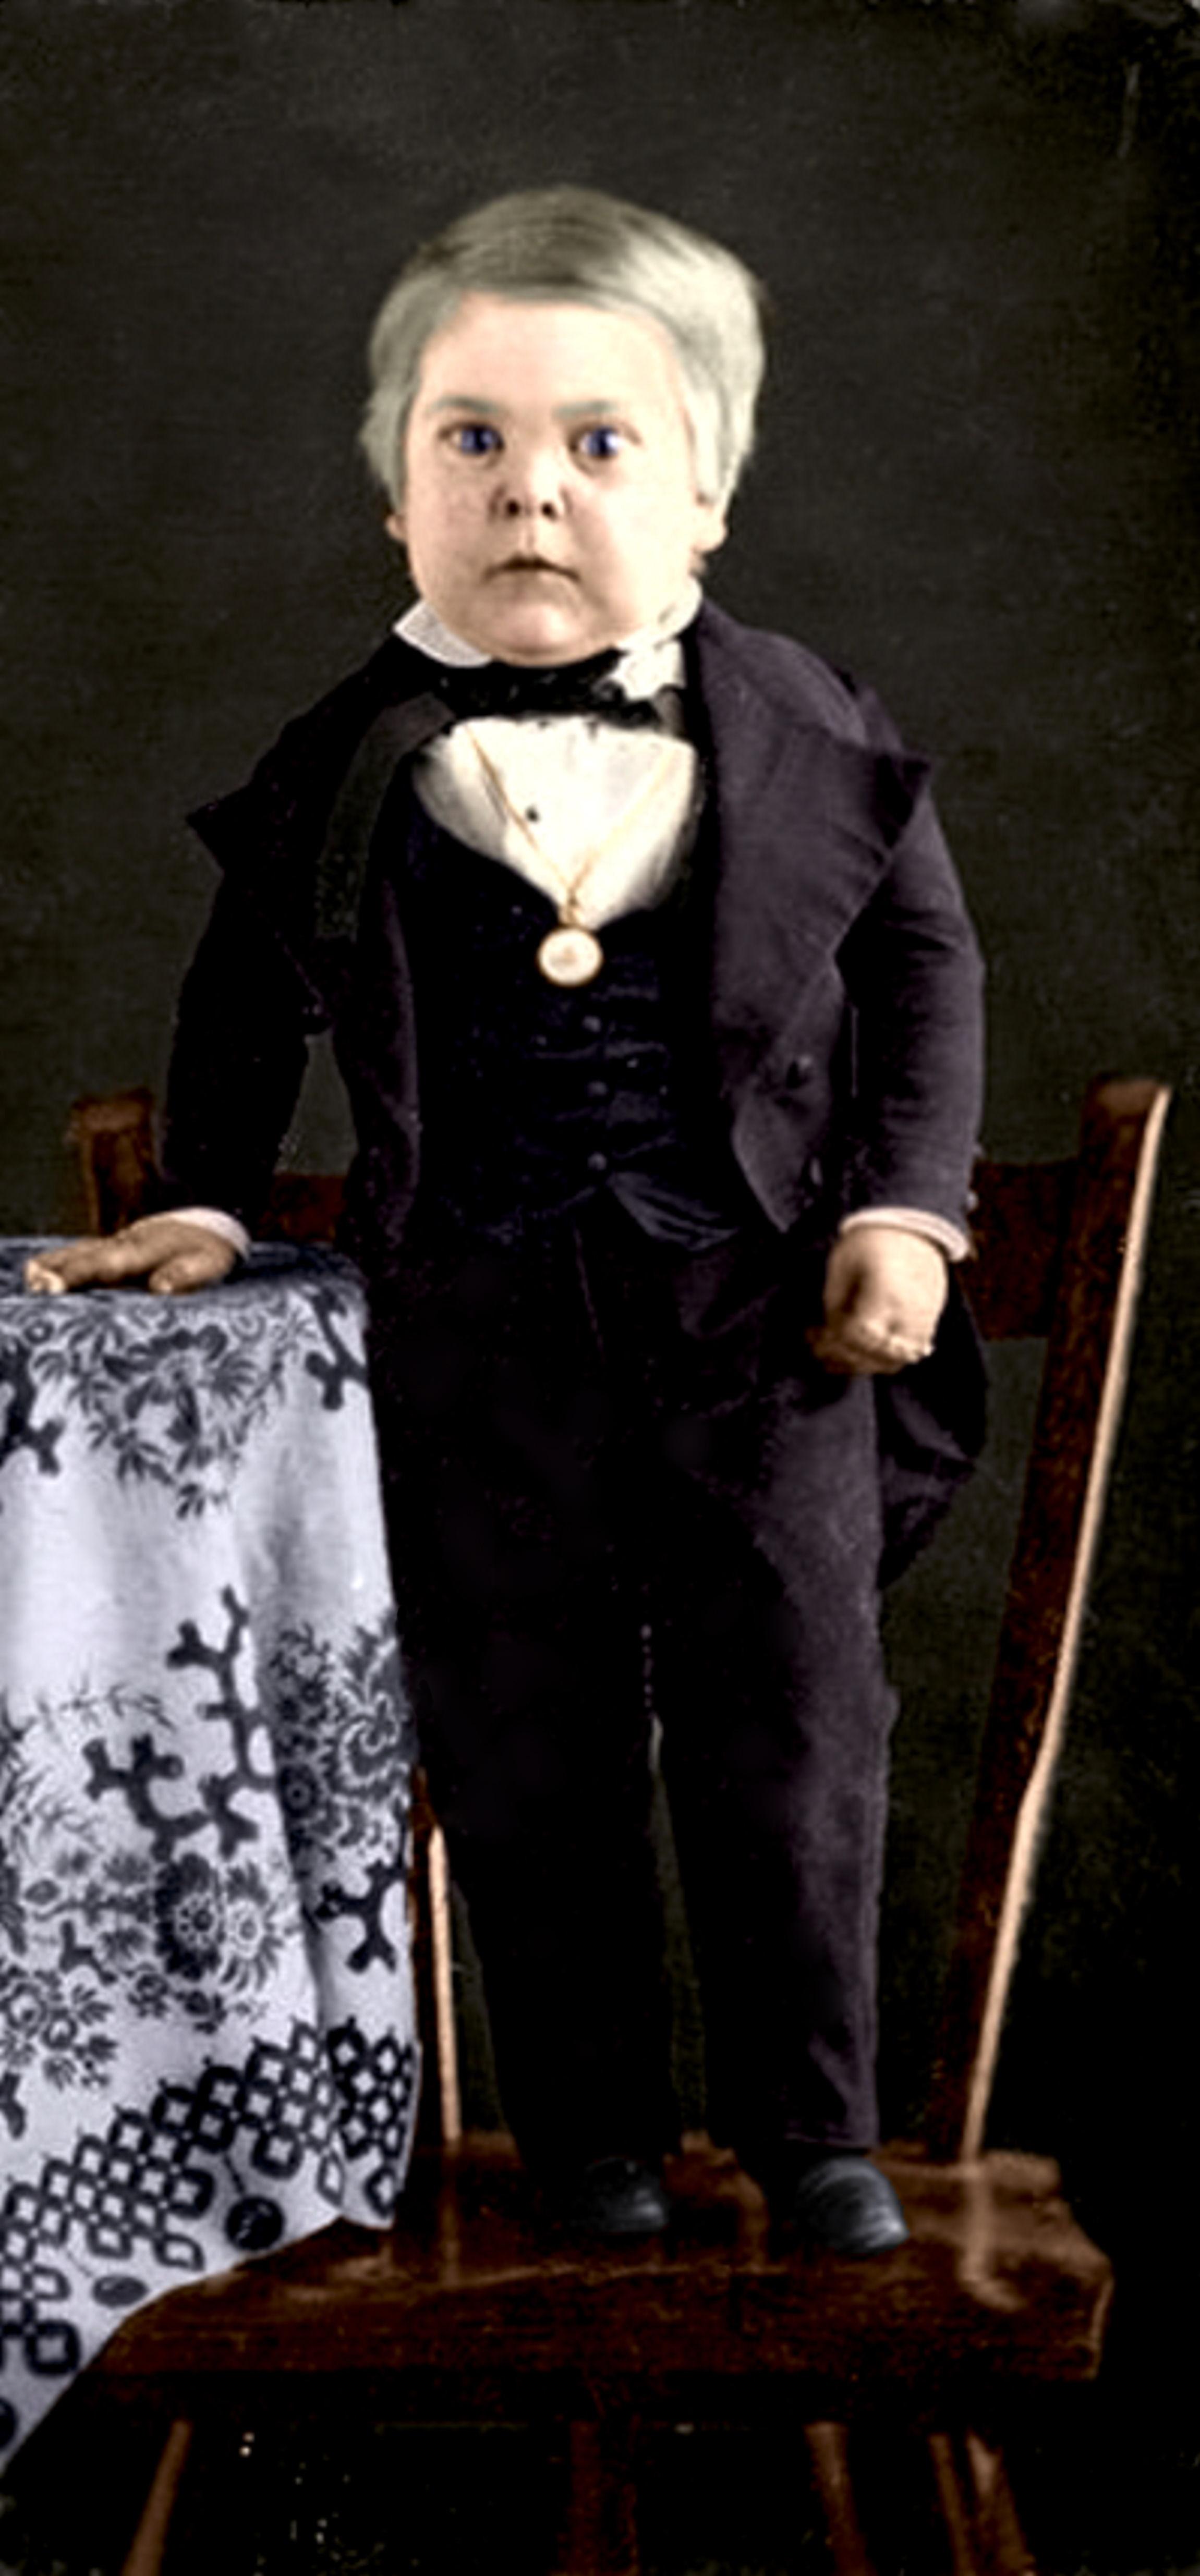 General Tom Thumb